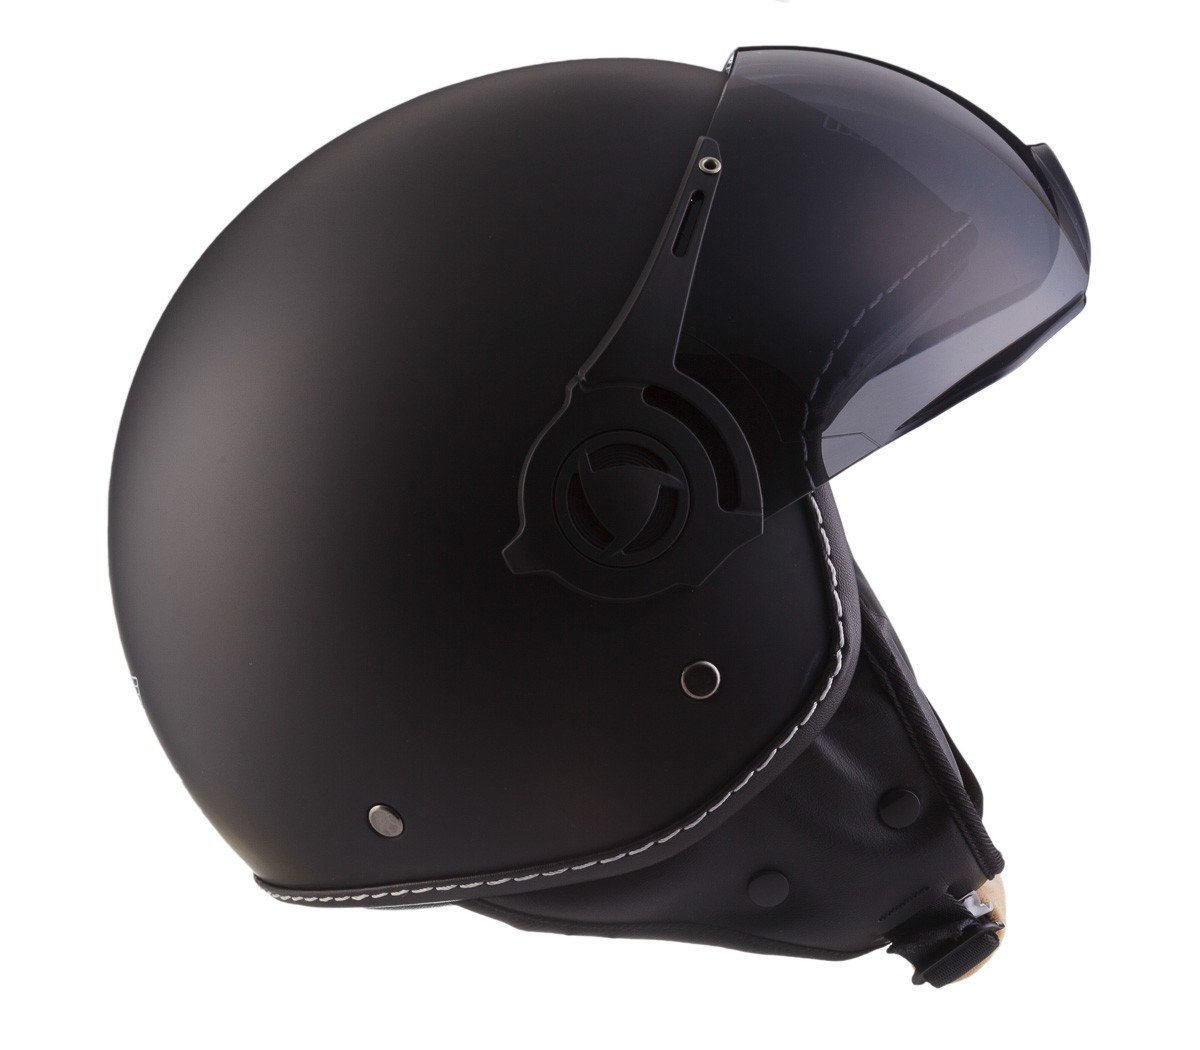 MOTO H44 Vintage Creme /· Vintage Pilot Moto-Helmet Jet-Helmet Biker Scooter-Helmet Mofa Chopper Cruiser Retro Bobber Vespa-Helmet /· ECE certified /· incl 61-62cm Cloth Bag /· Beige /· XL Sun Visor /· incl